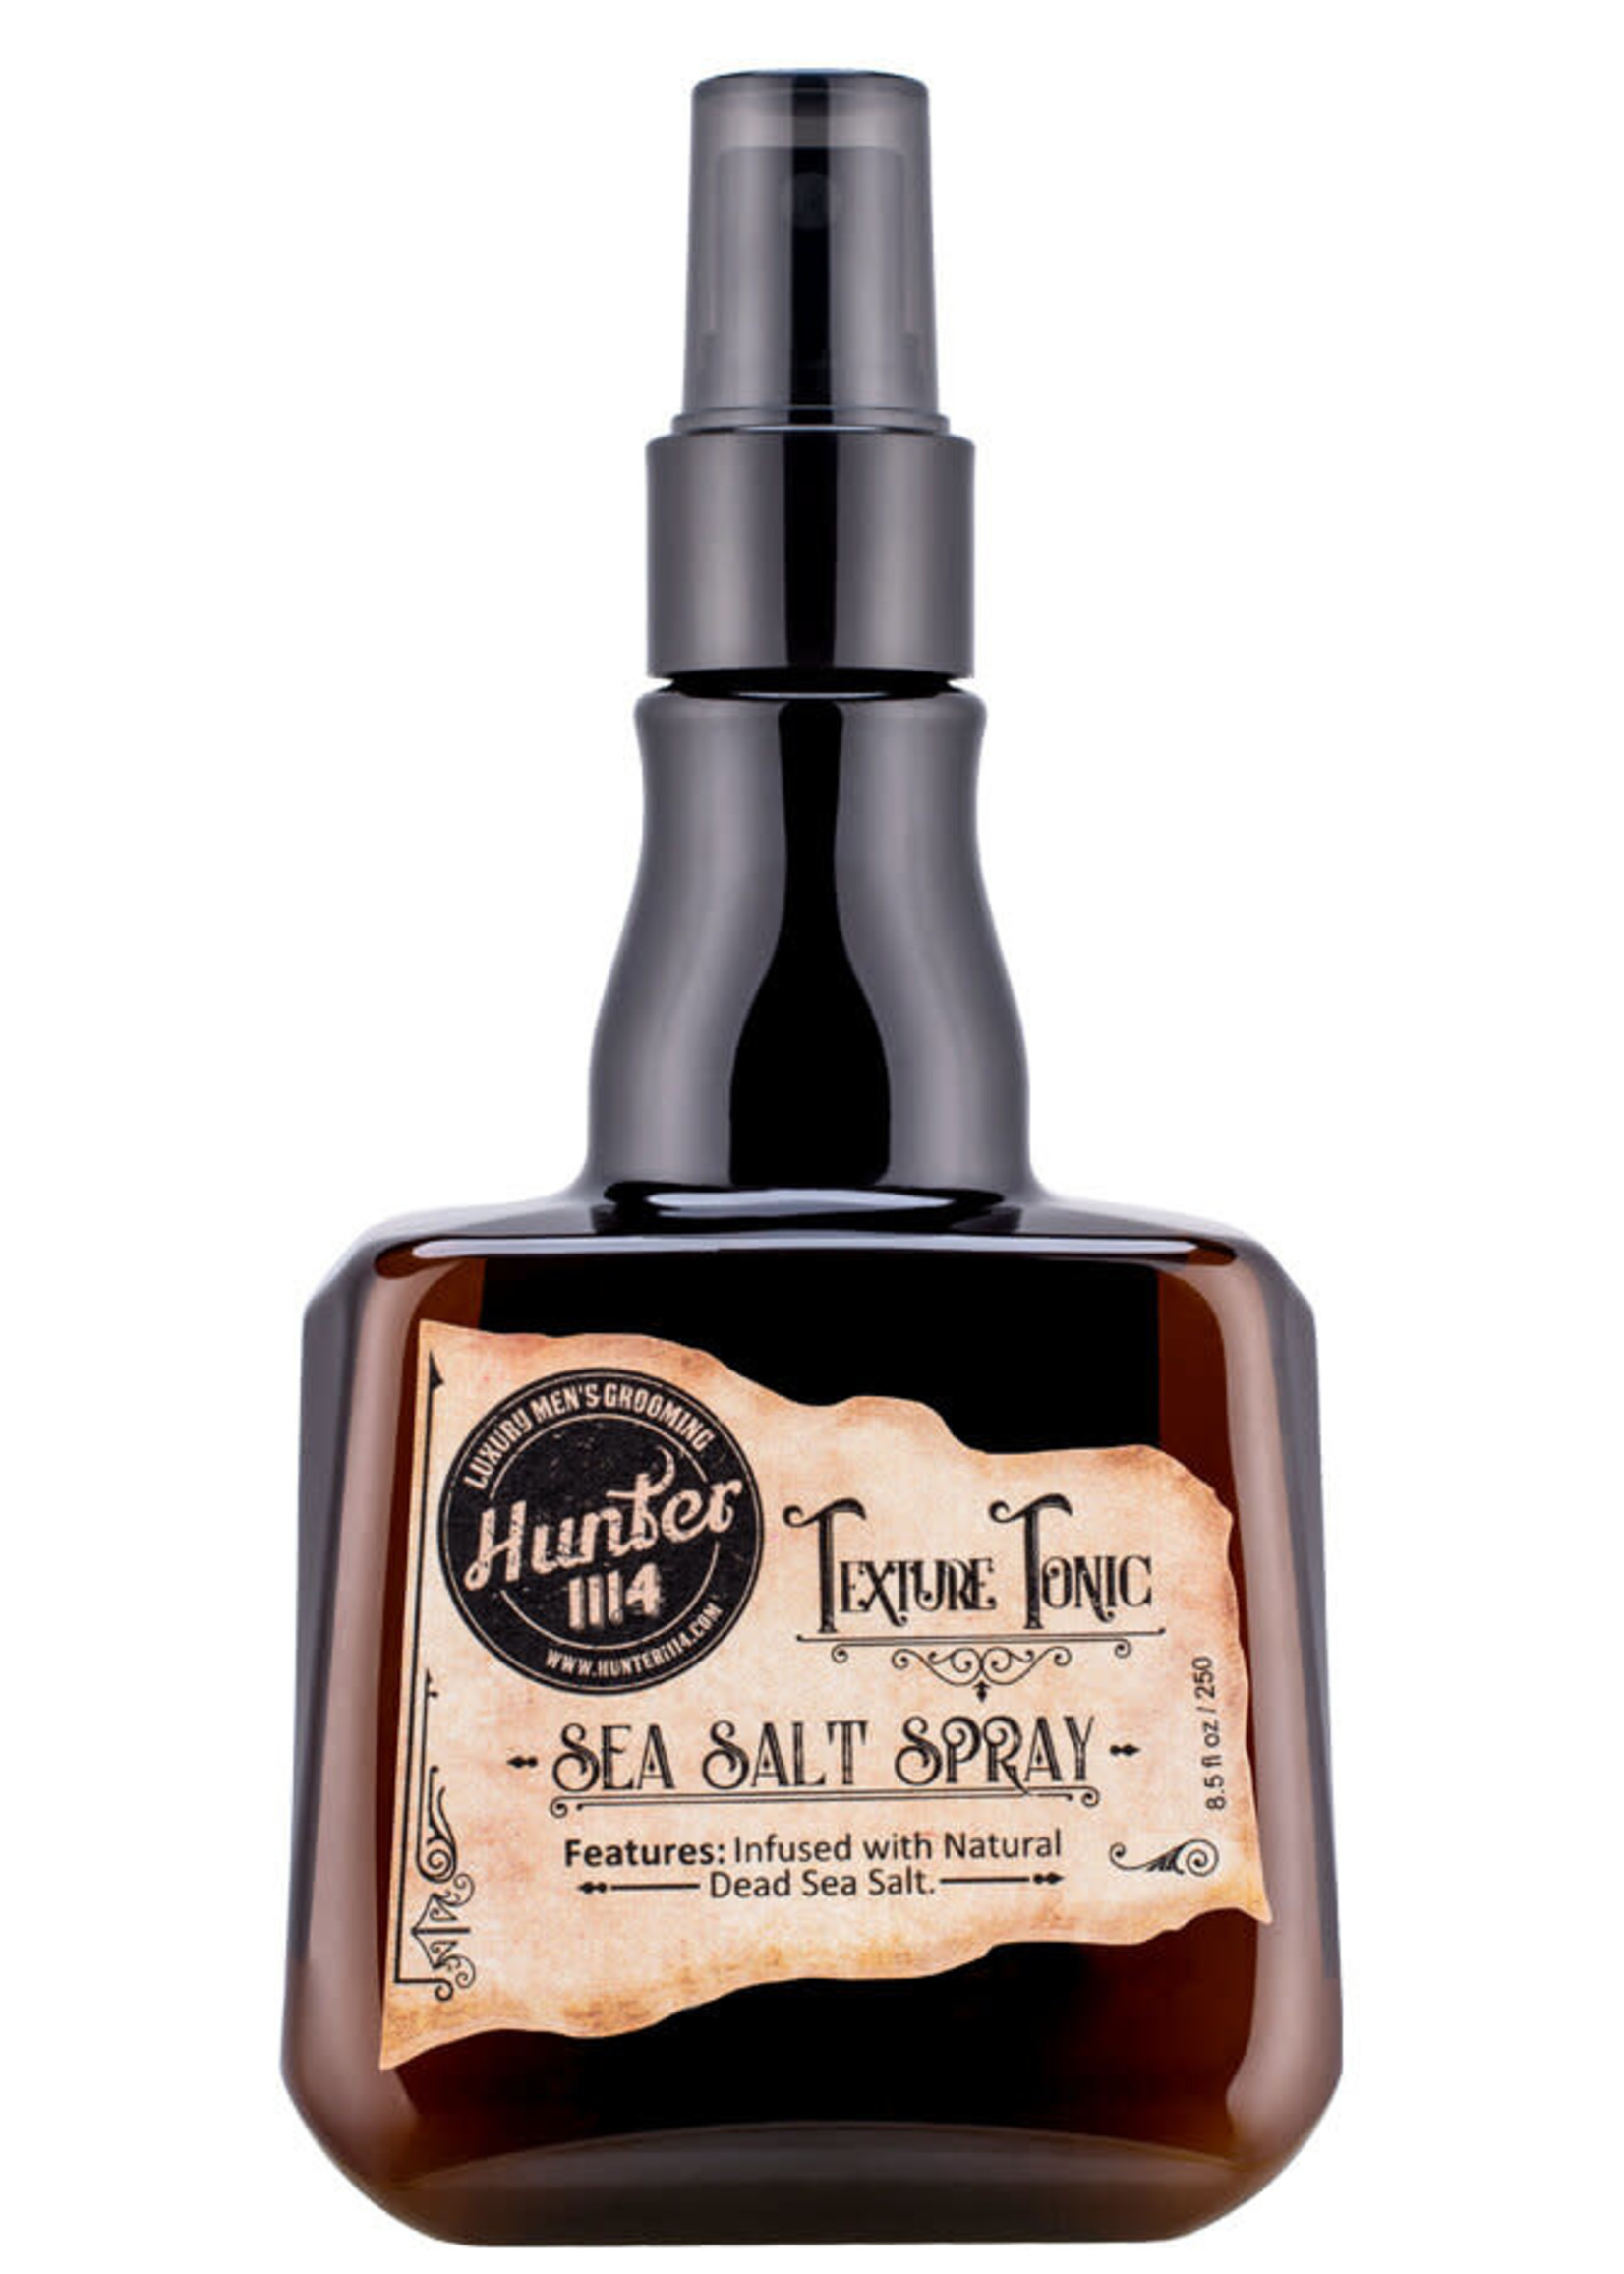 Hunter1114 Hunter 1114- Sea Salt Spray- 8.5oz